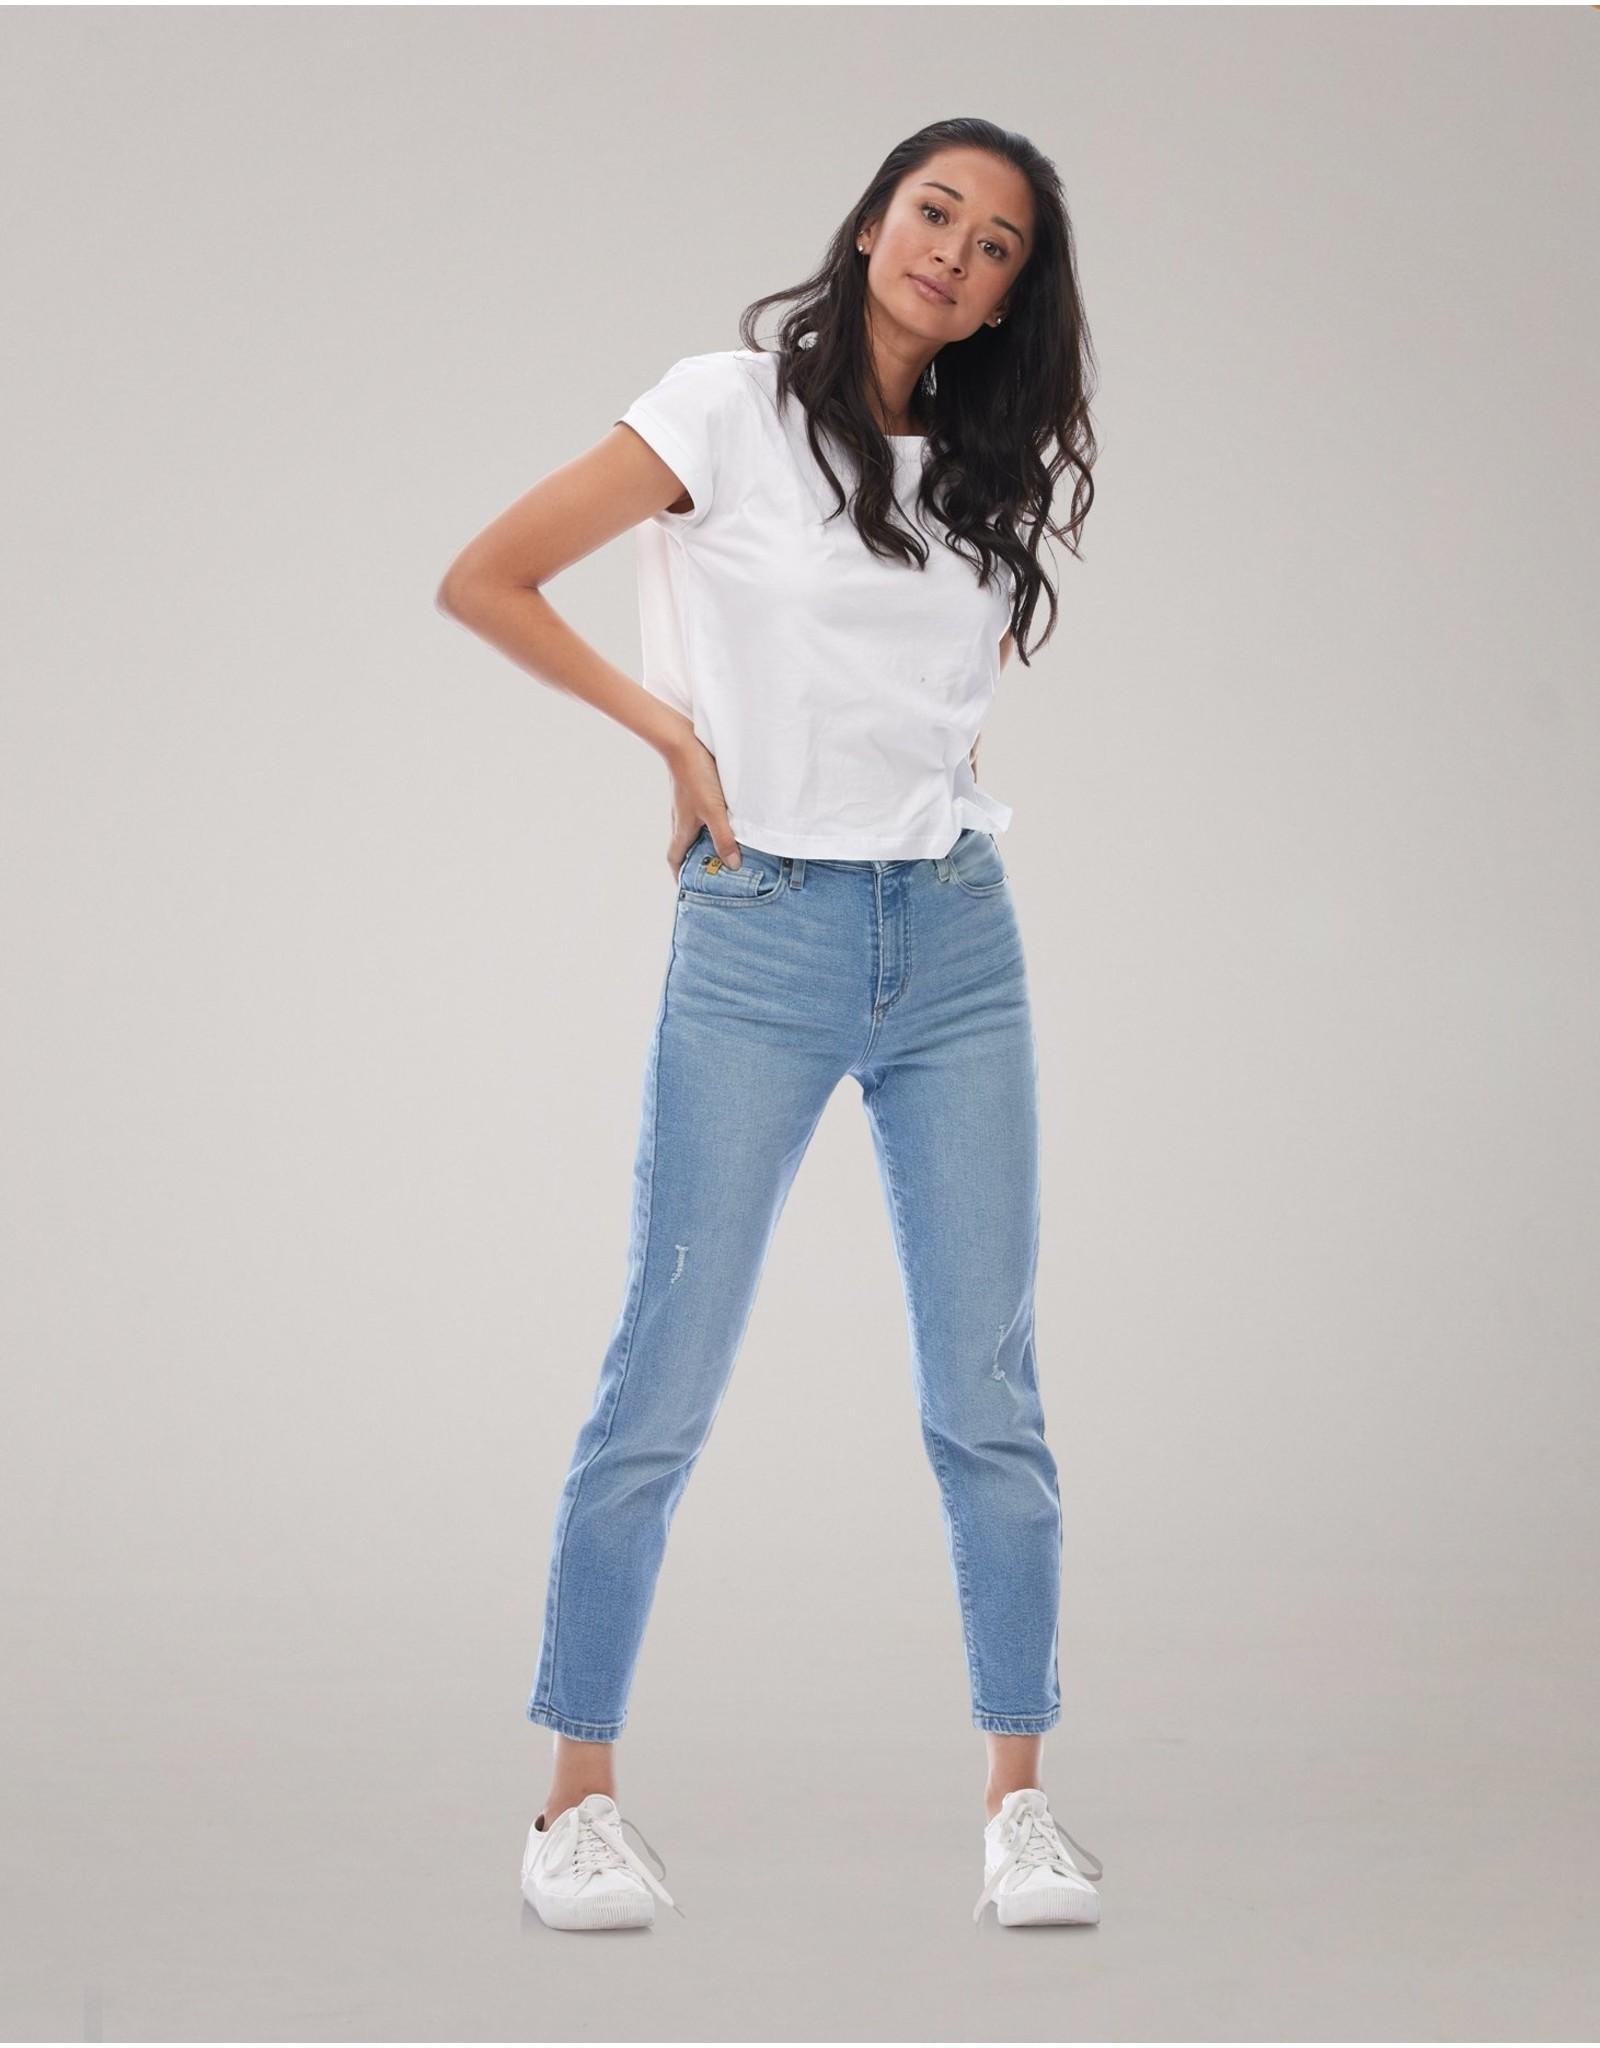 Yoga Jeans - Emily Slim - Muse